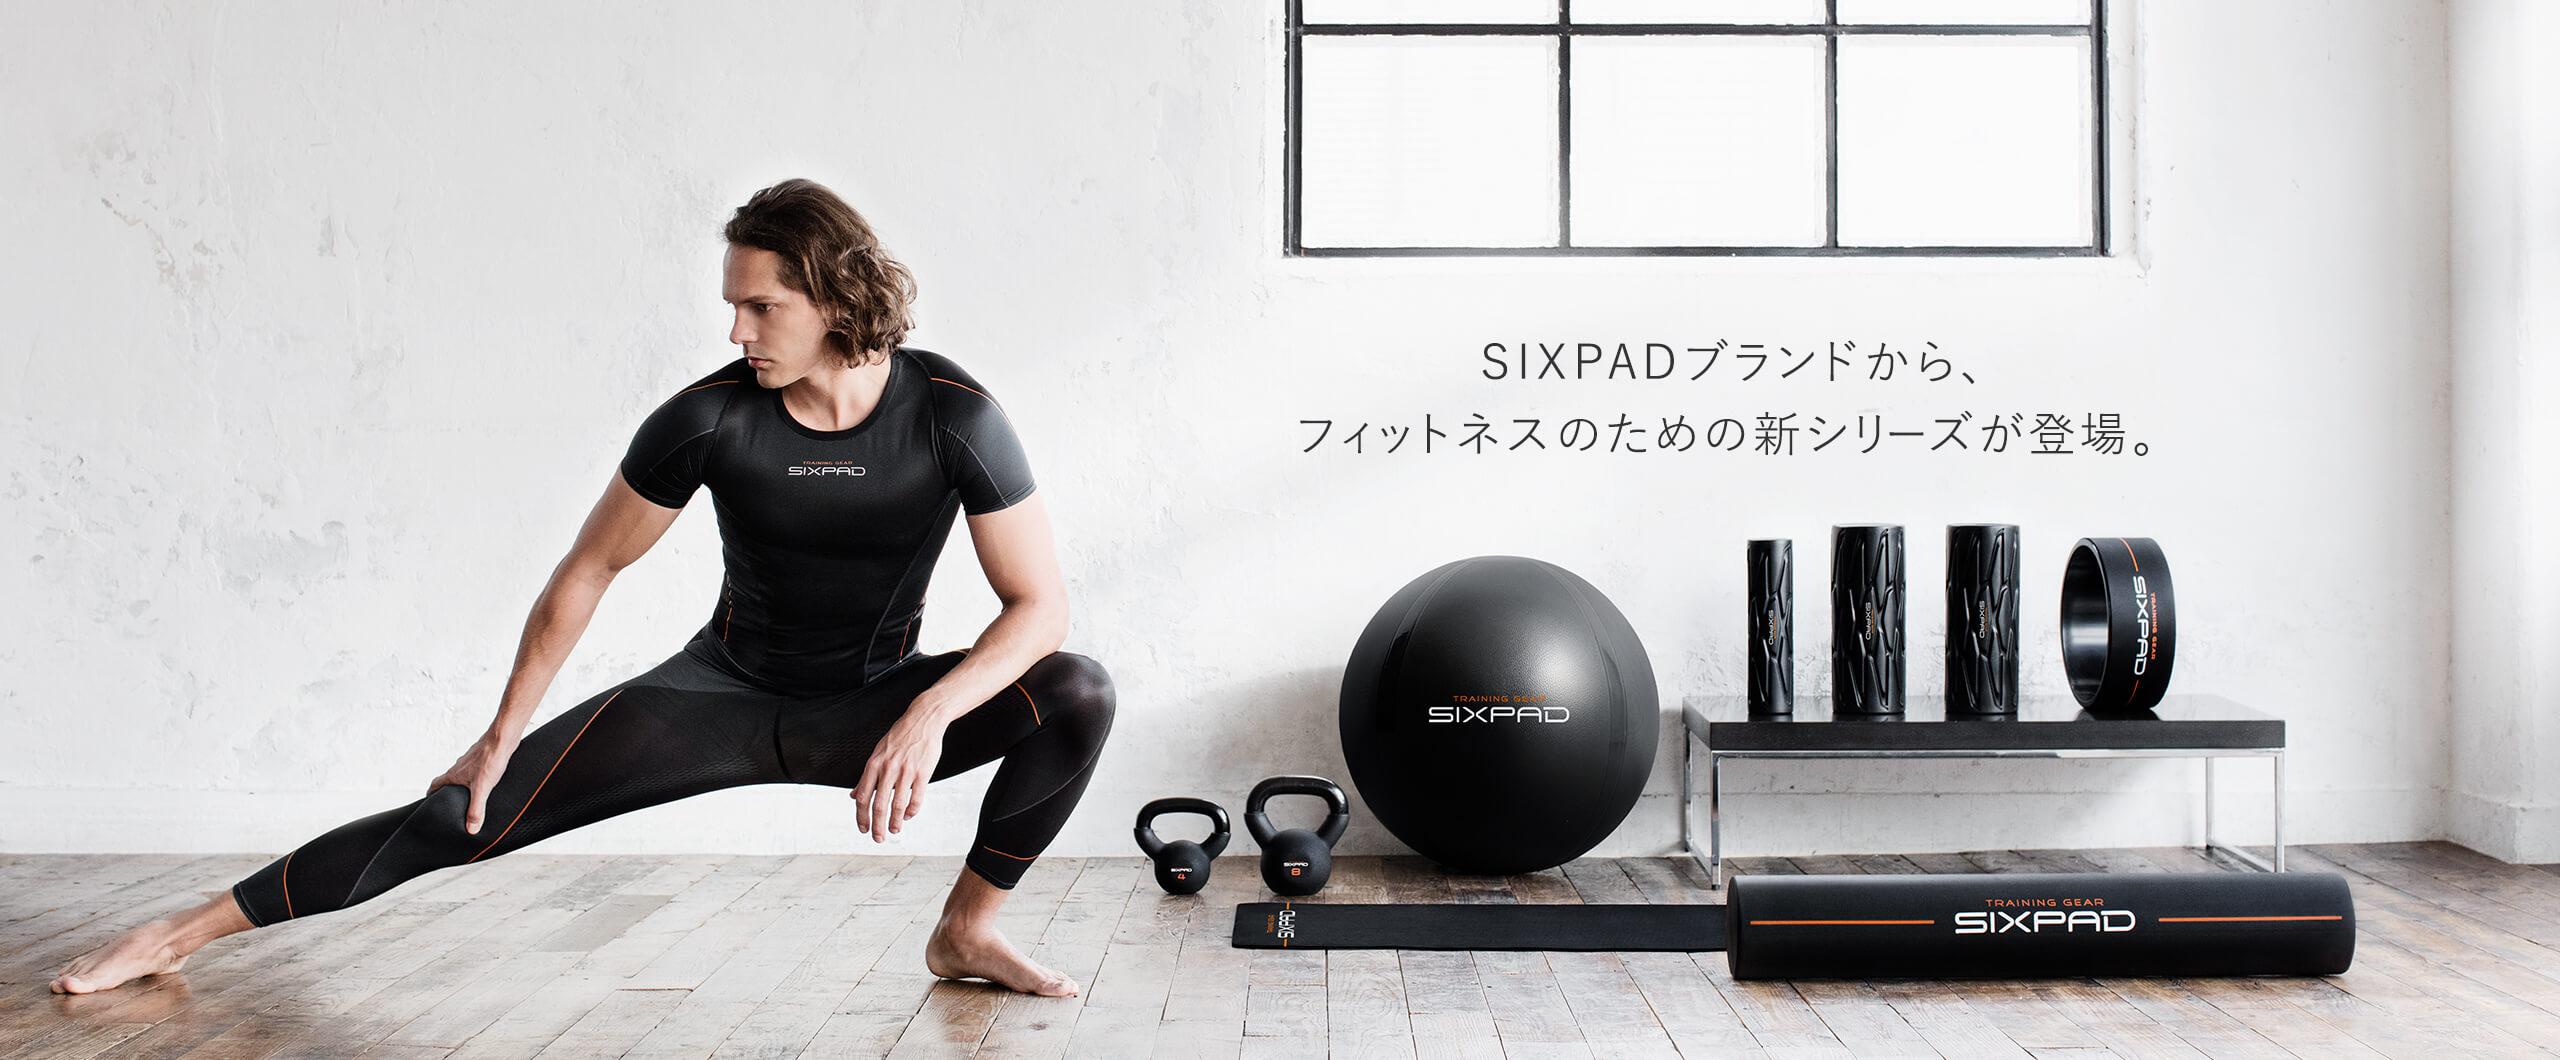 SIXPADブランドから、フィットネスのための新シリーズが登場。SIXPAD Fitness Serires